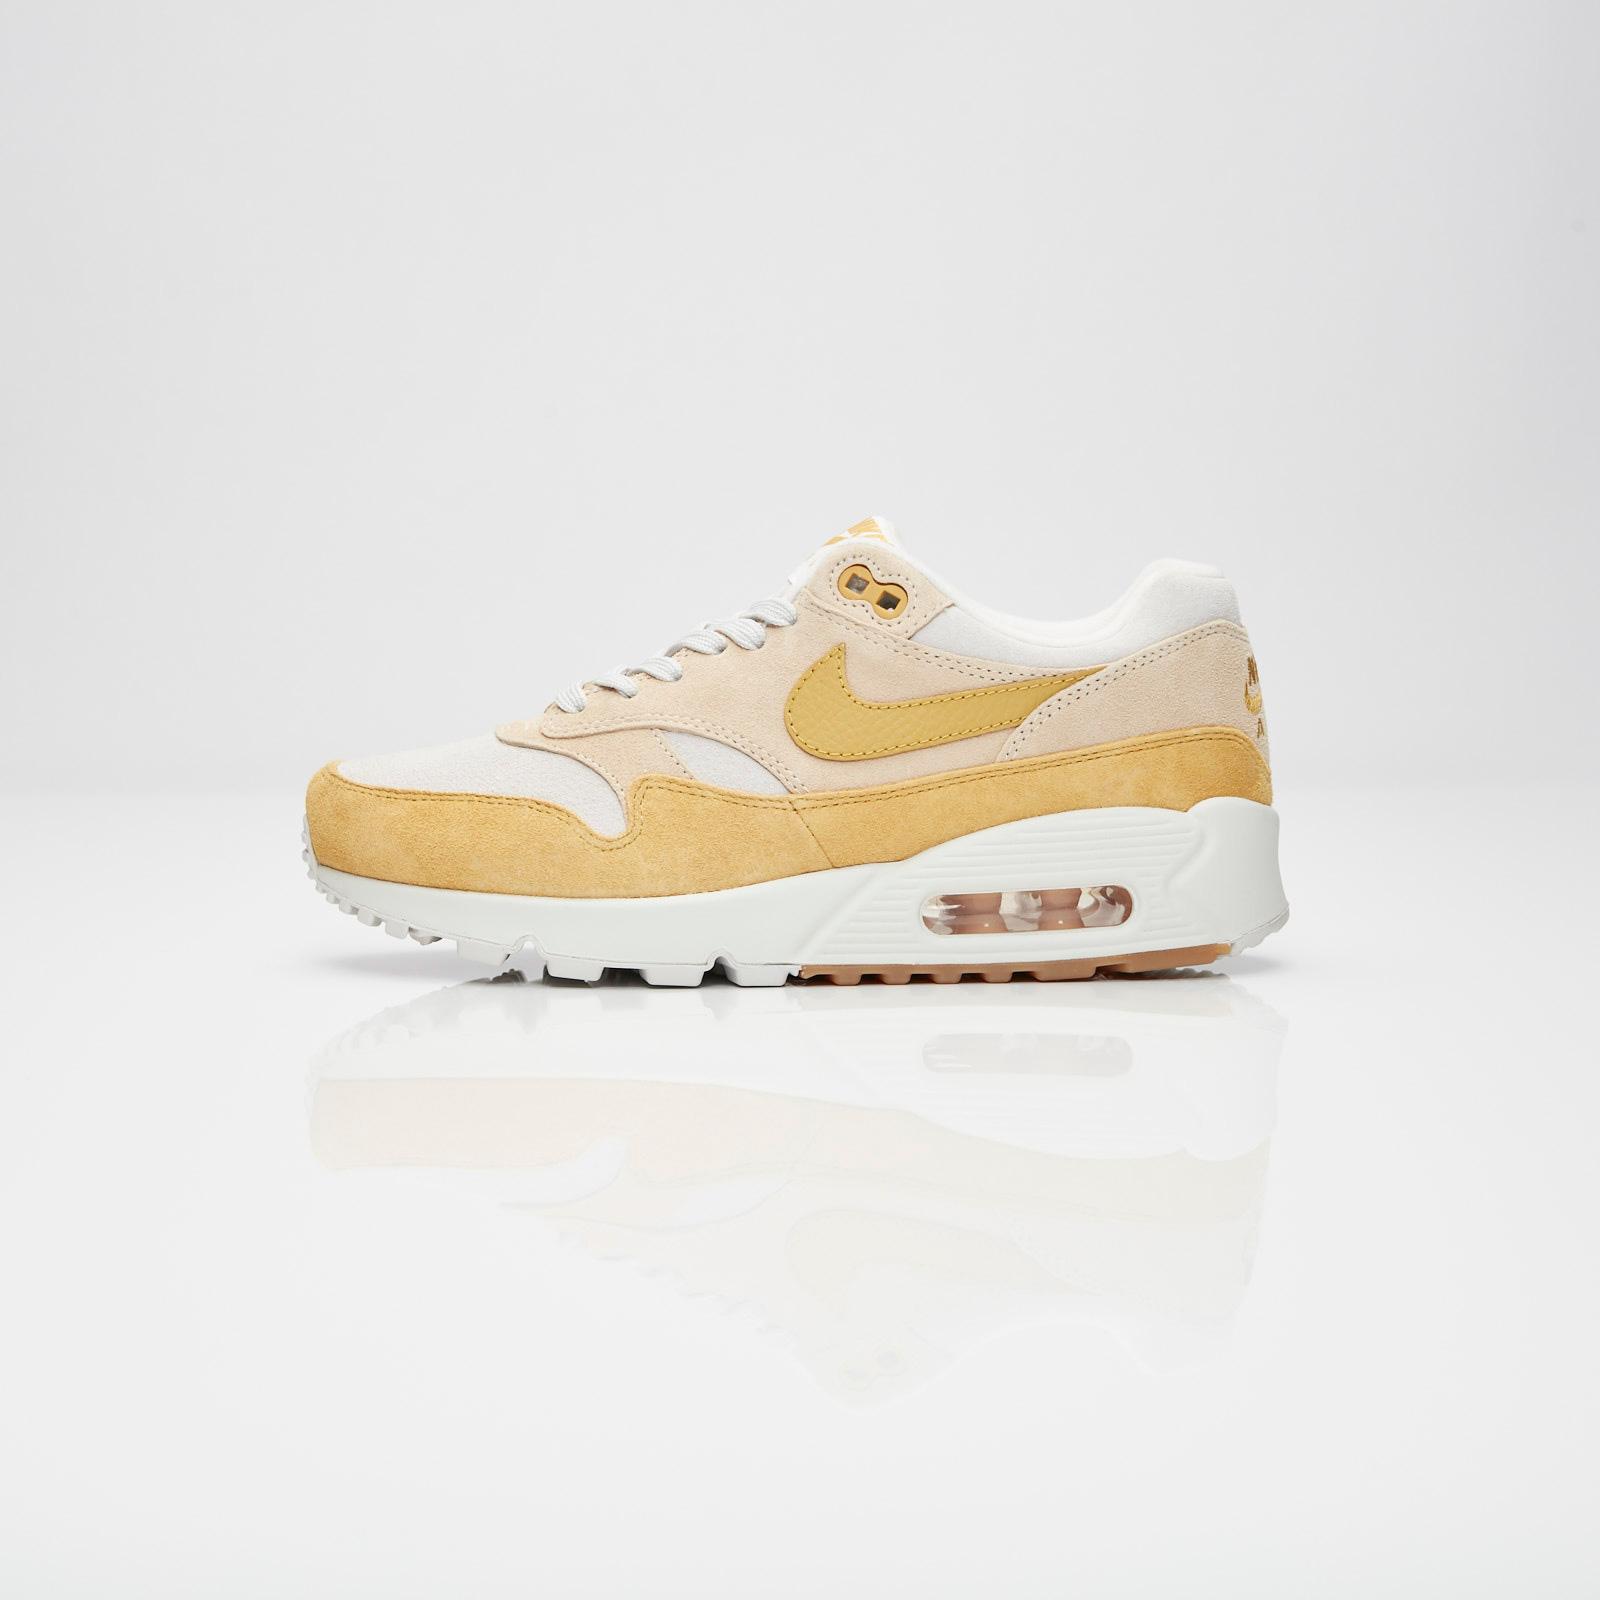 d14ac8cece Nike Wmns Air Max 90/1 - Aq1273-800 - Sneakersnstuff | sneakers &  streetwear online since 1999